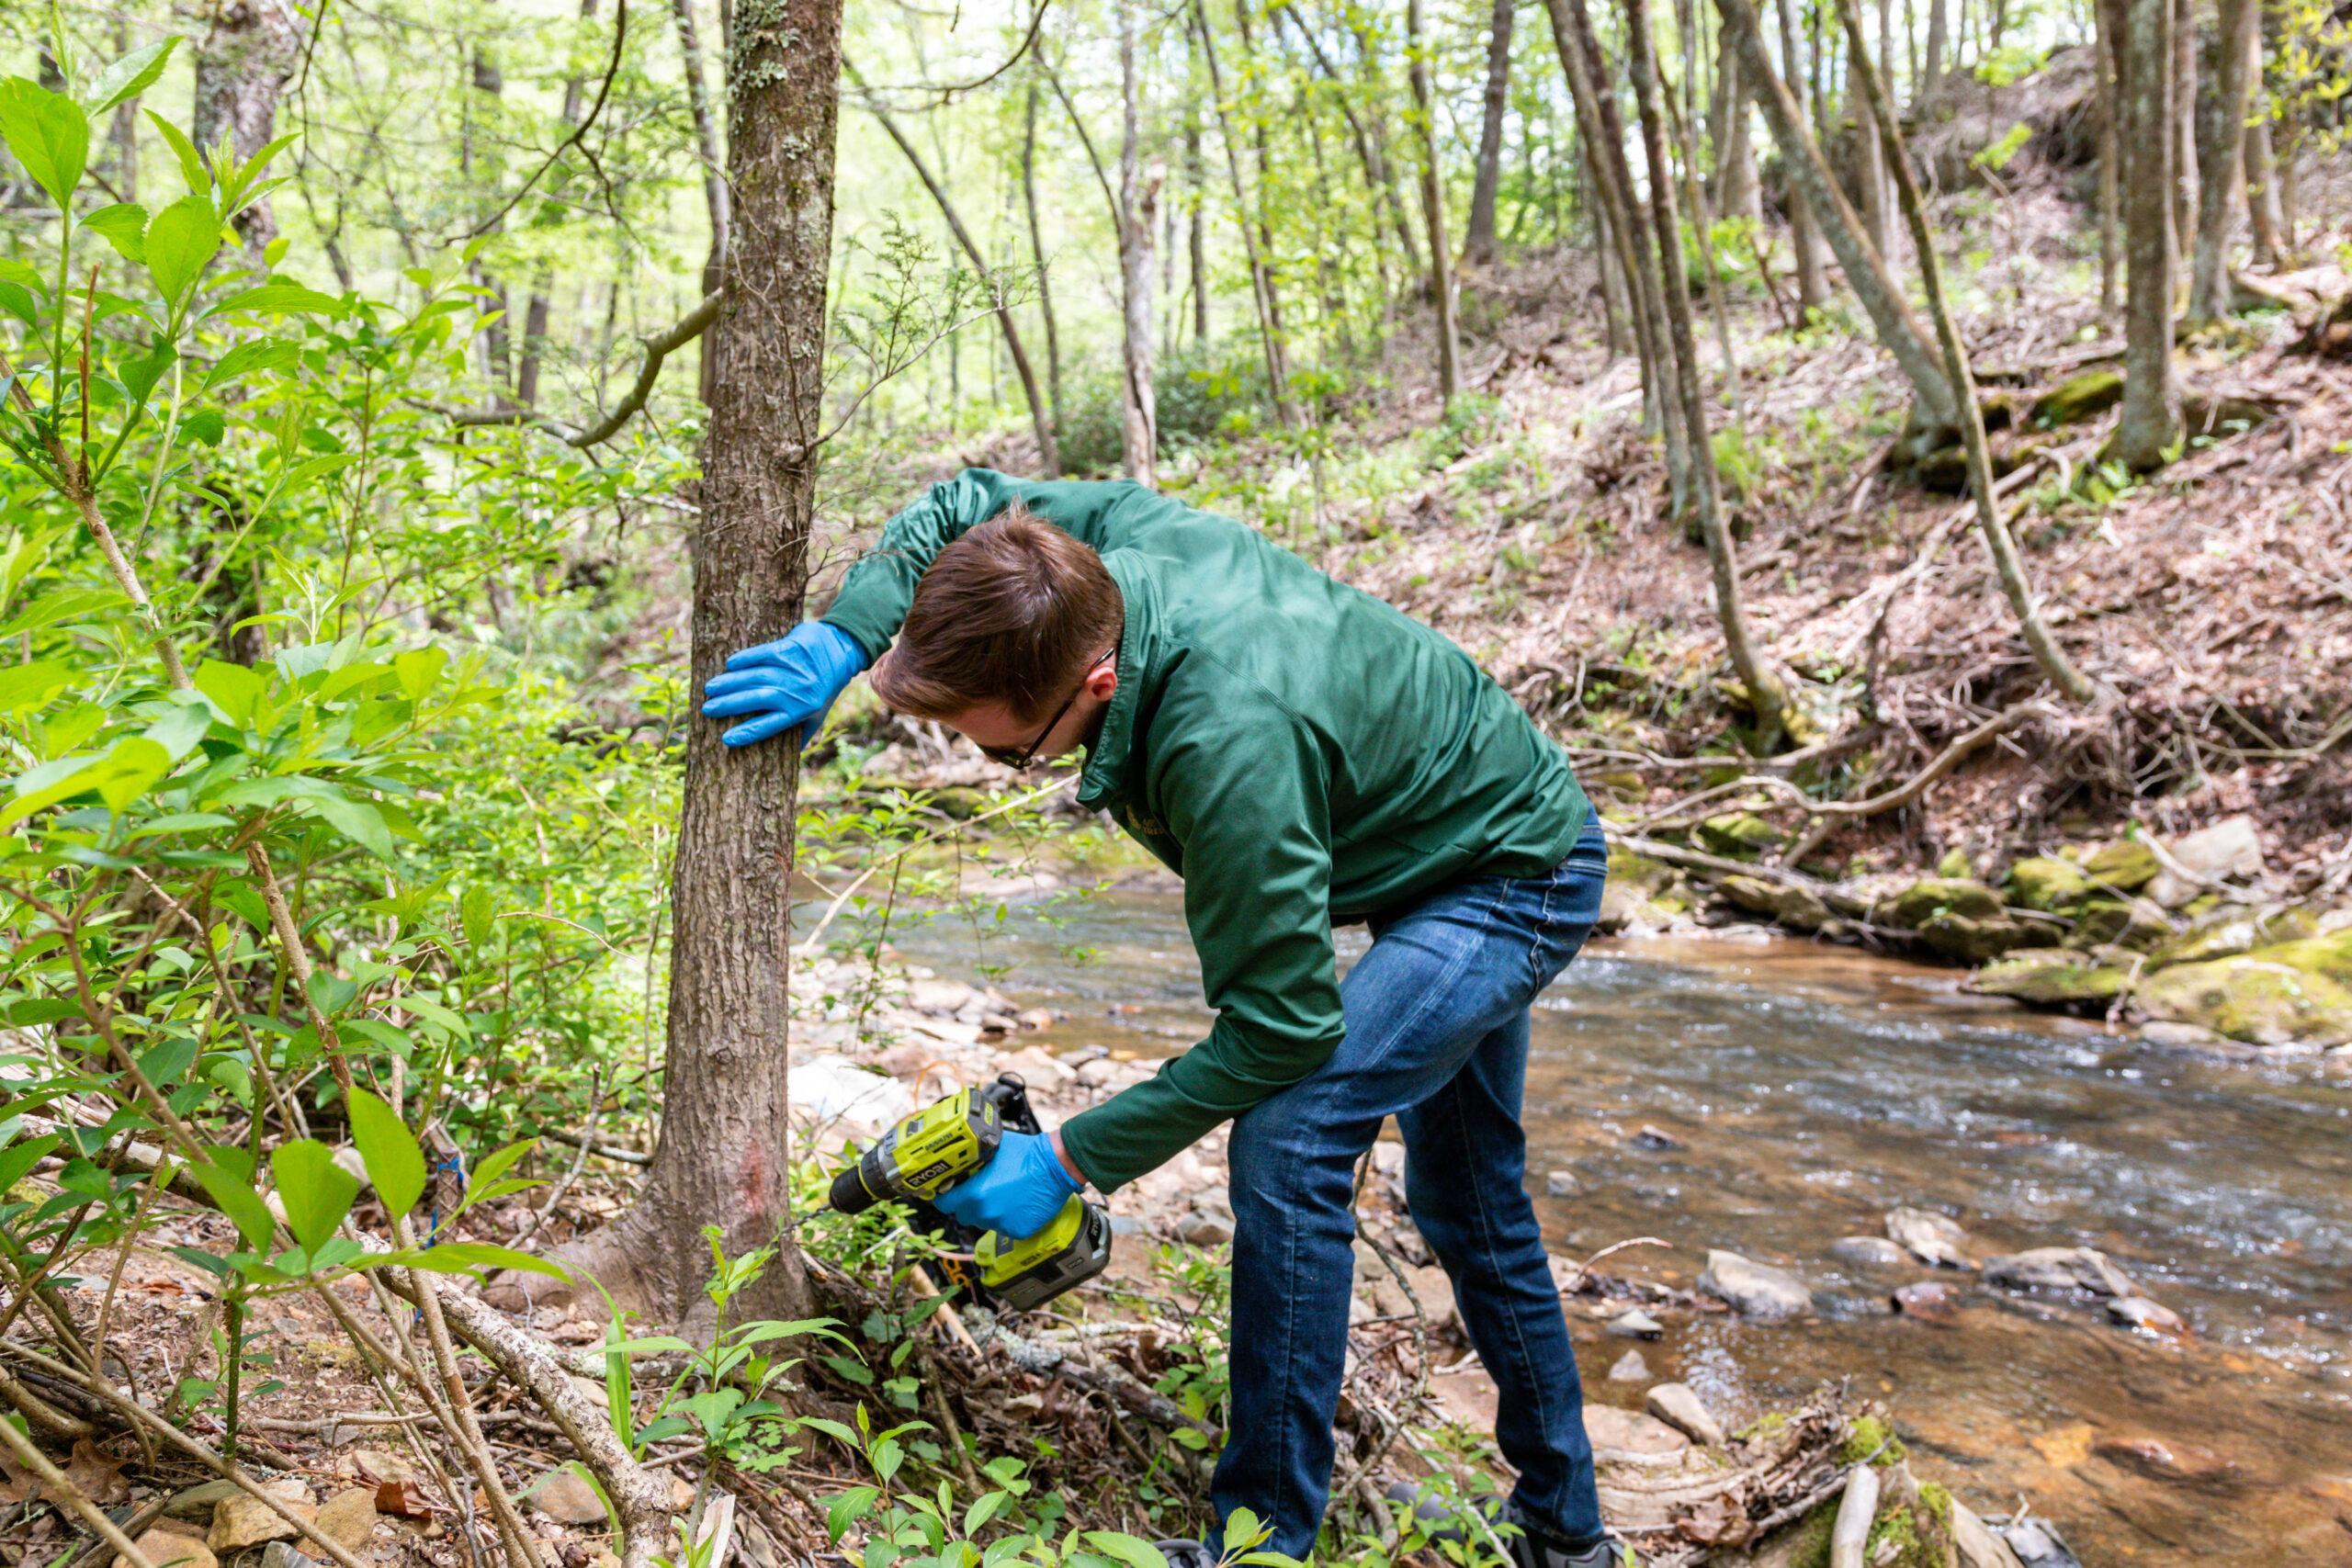 Certified Arborist Preparing A Tree For Treatment